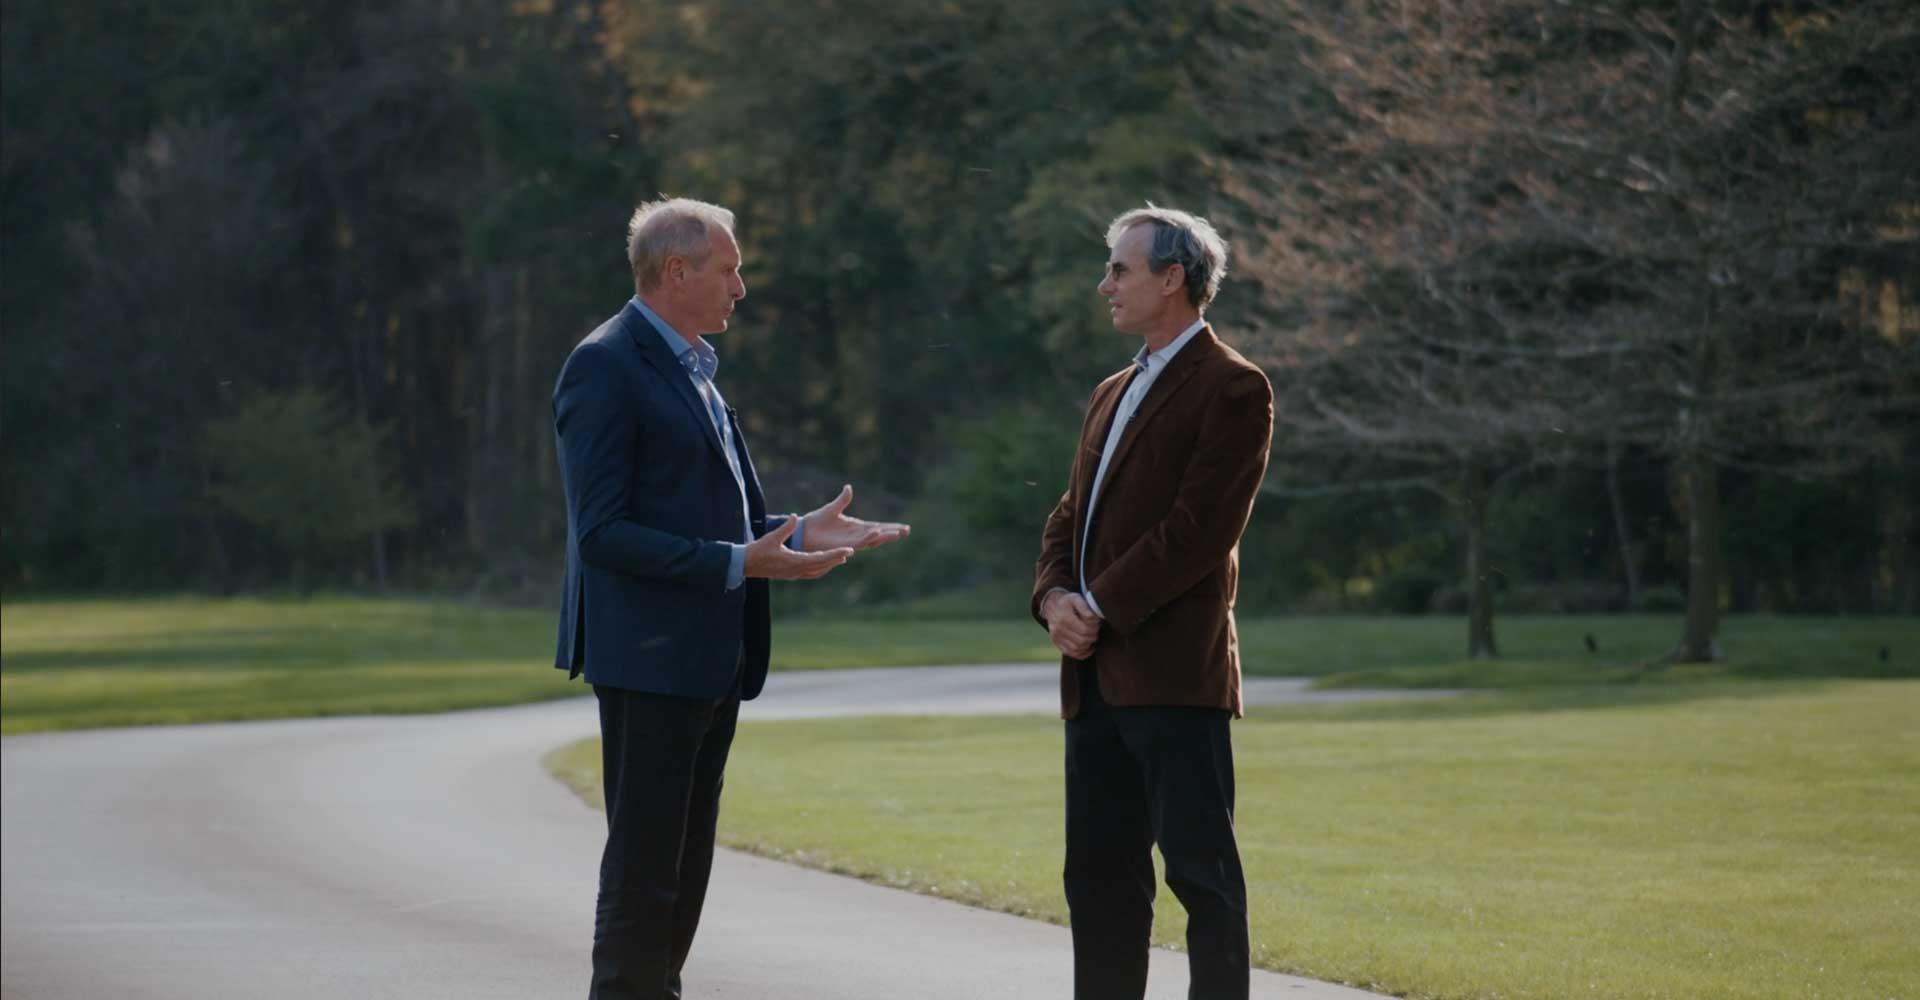 Former former Deputy Assistant Secretary of Defense Chris Mellon reveals startling information to Ross Coulthart.